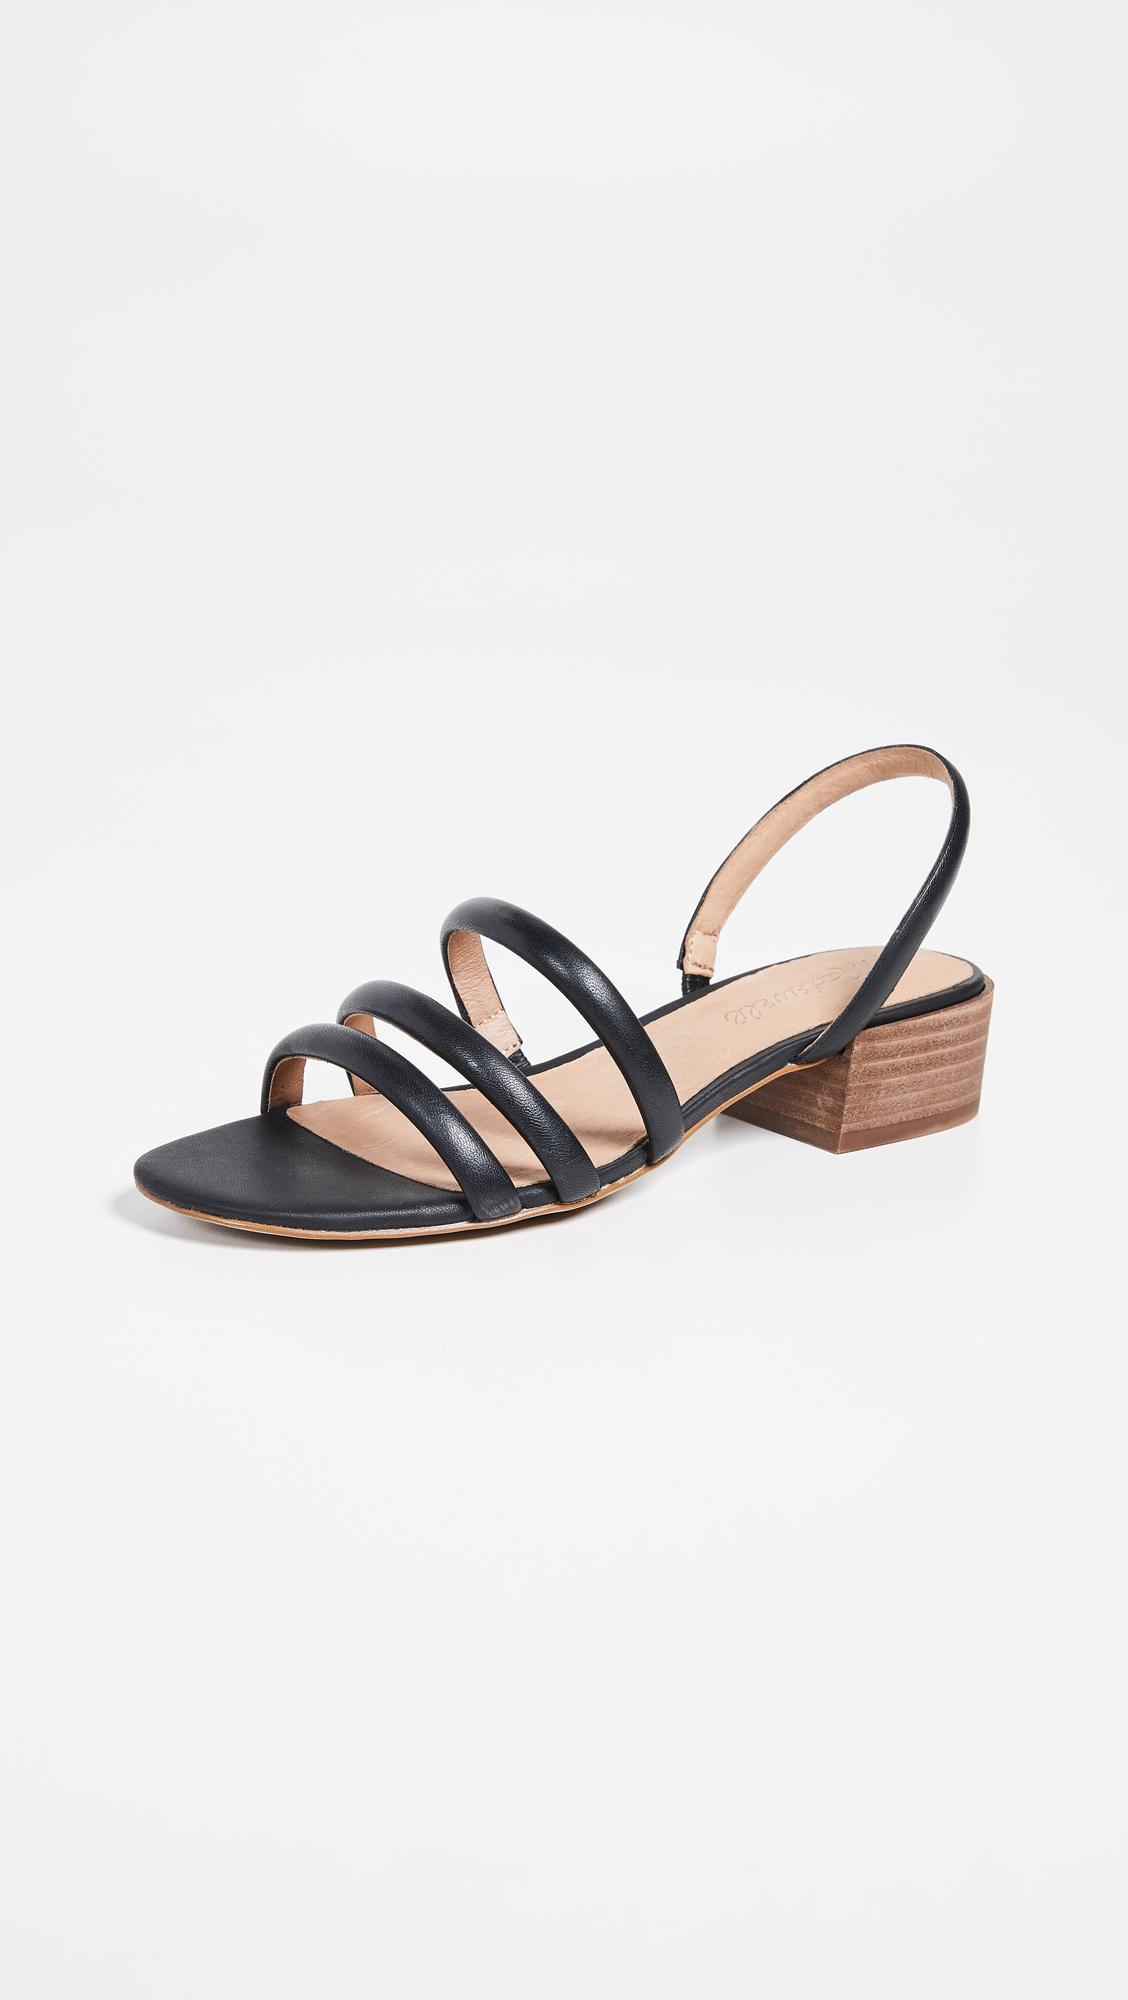 7ebe6e537c0 Lyst - Madewell The Addie Slingback Sandals in Black